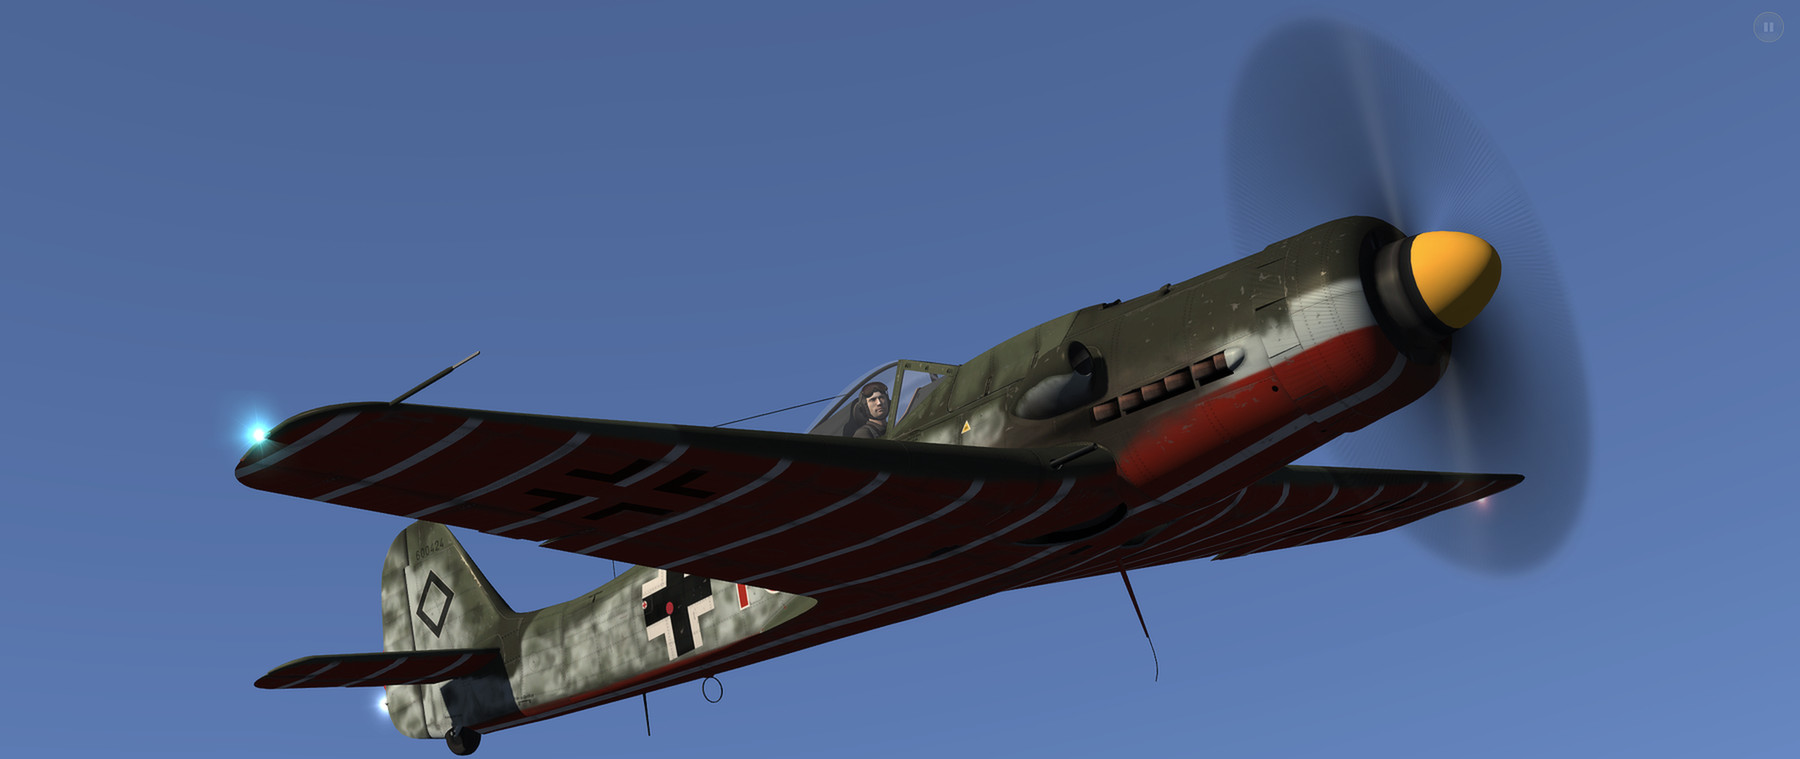 DCS: Fw 190 D-9 Dora screenshot